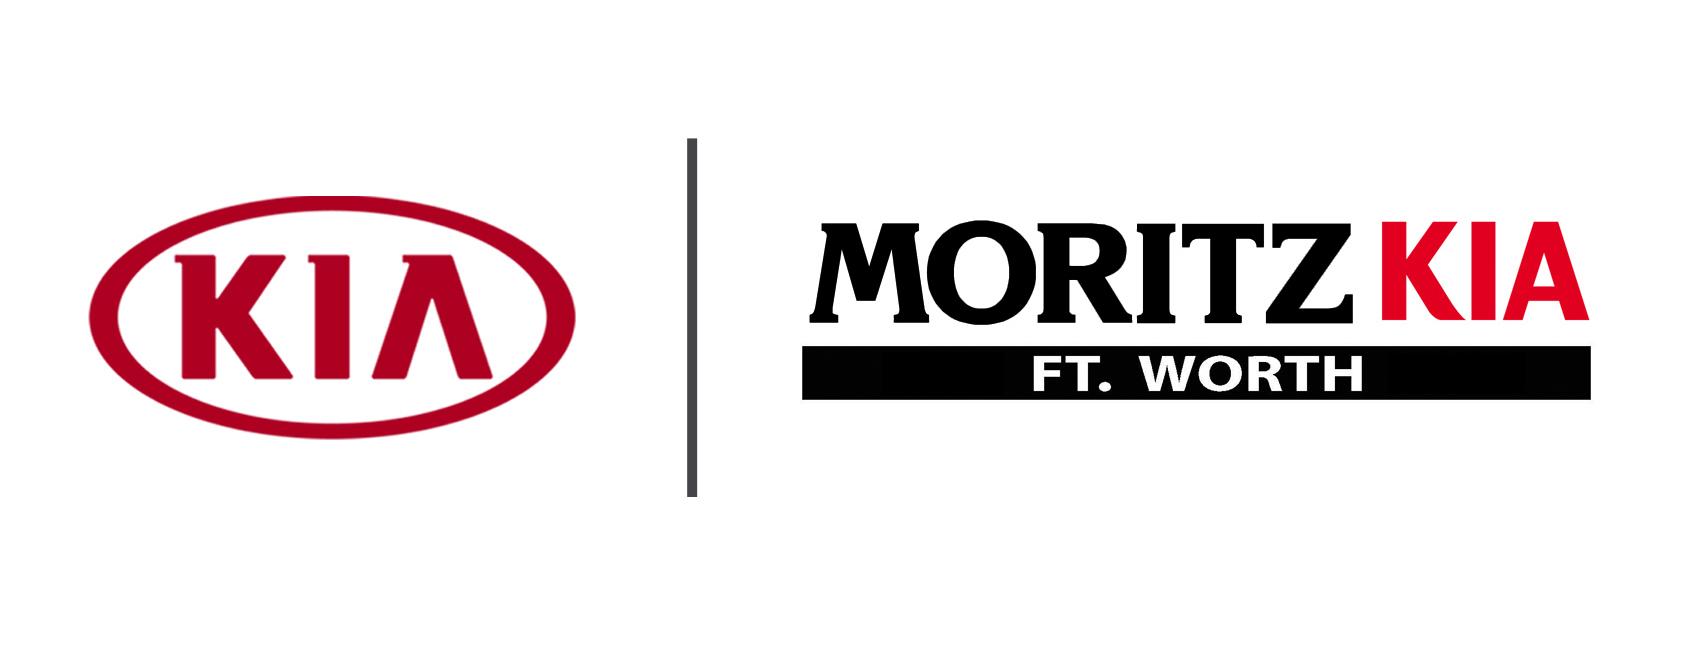 Moritz Kia Fort Worth >> Schedule Car Maintenance Auto Repair Fort Worth Tx Moritz Kia Ft